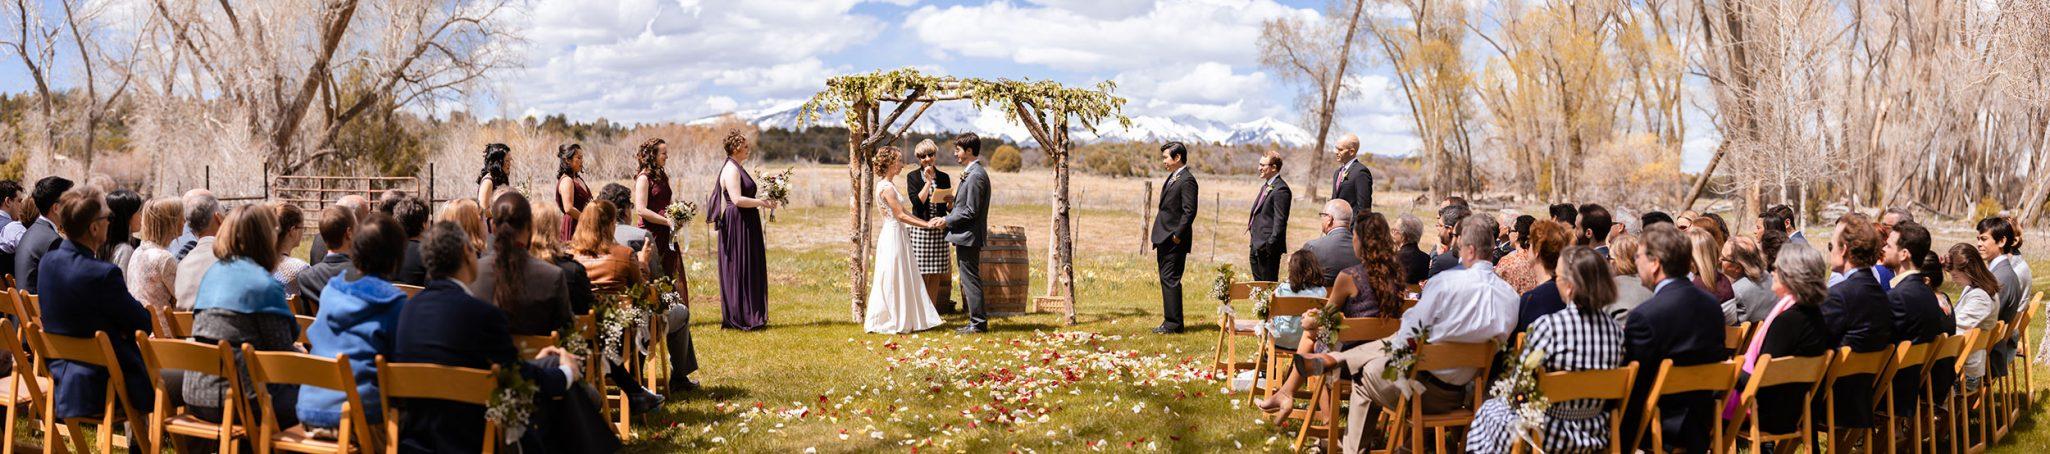 A spring wedding at Ridgewood Event Center by Kara Cavalca